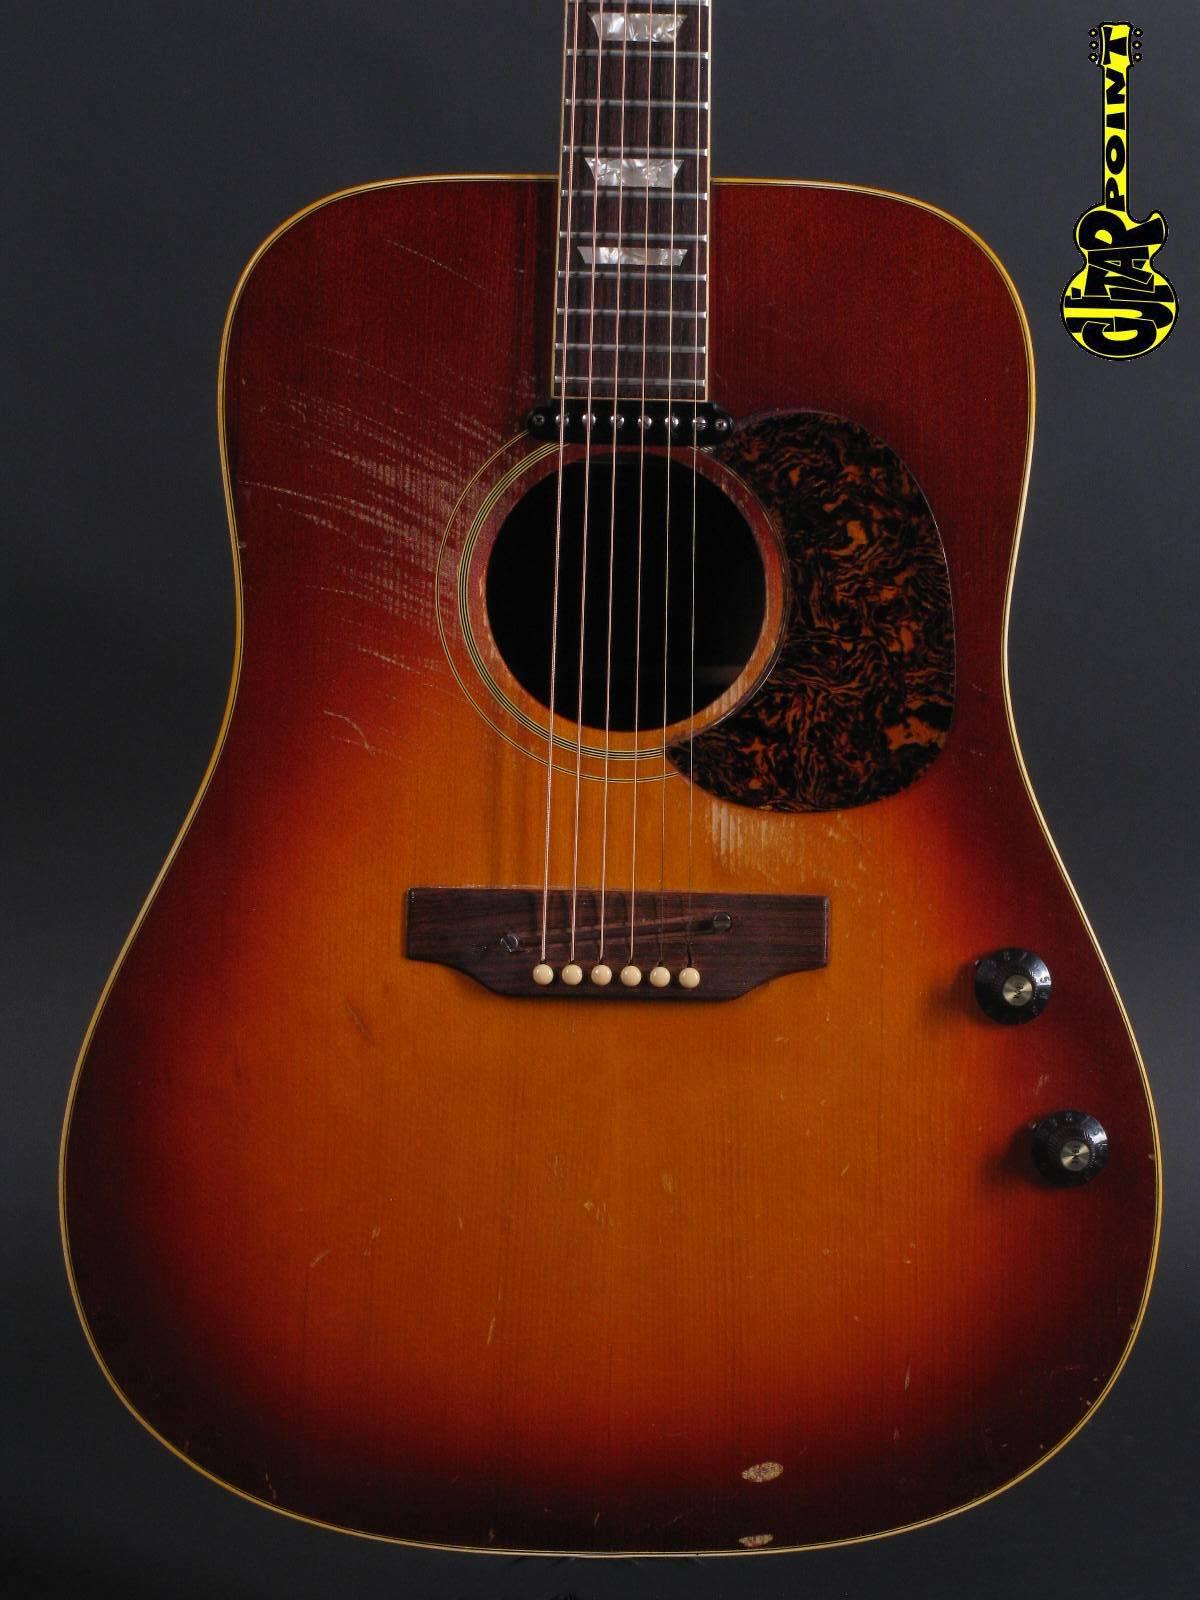 1972 Gibson EJ-160E - Sunburst